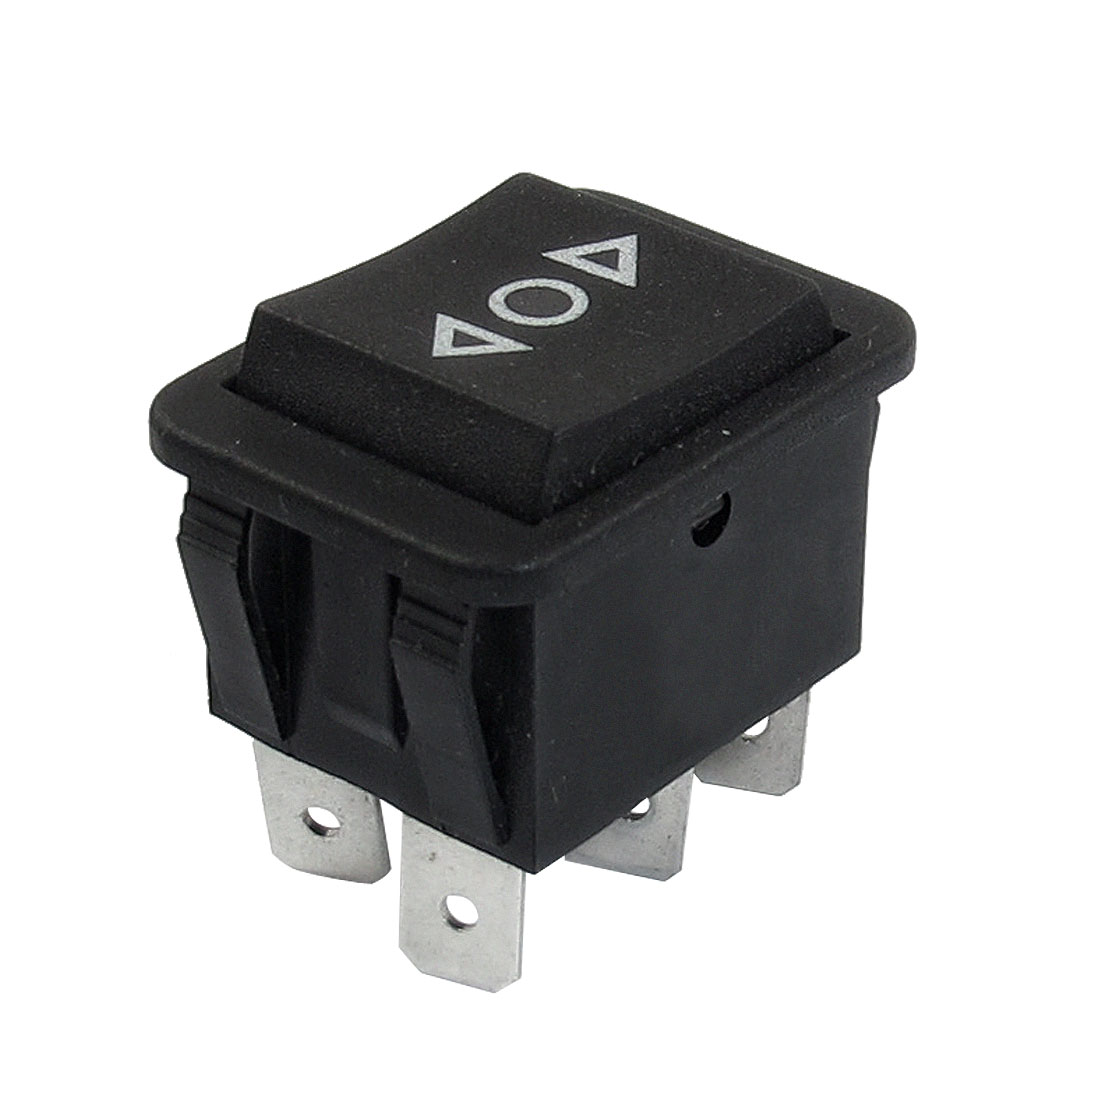 Momentary 6 Pin DPDT Black Button On/Off/On Rocker Switch AC 250V/10A 125V/15A